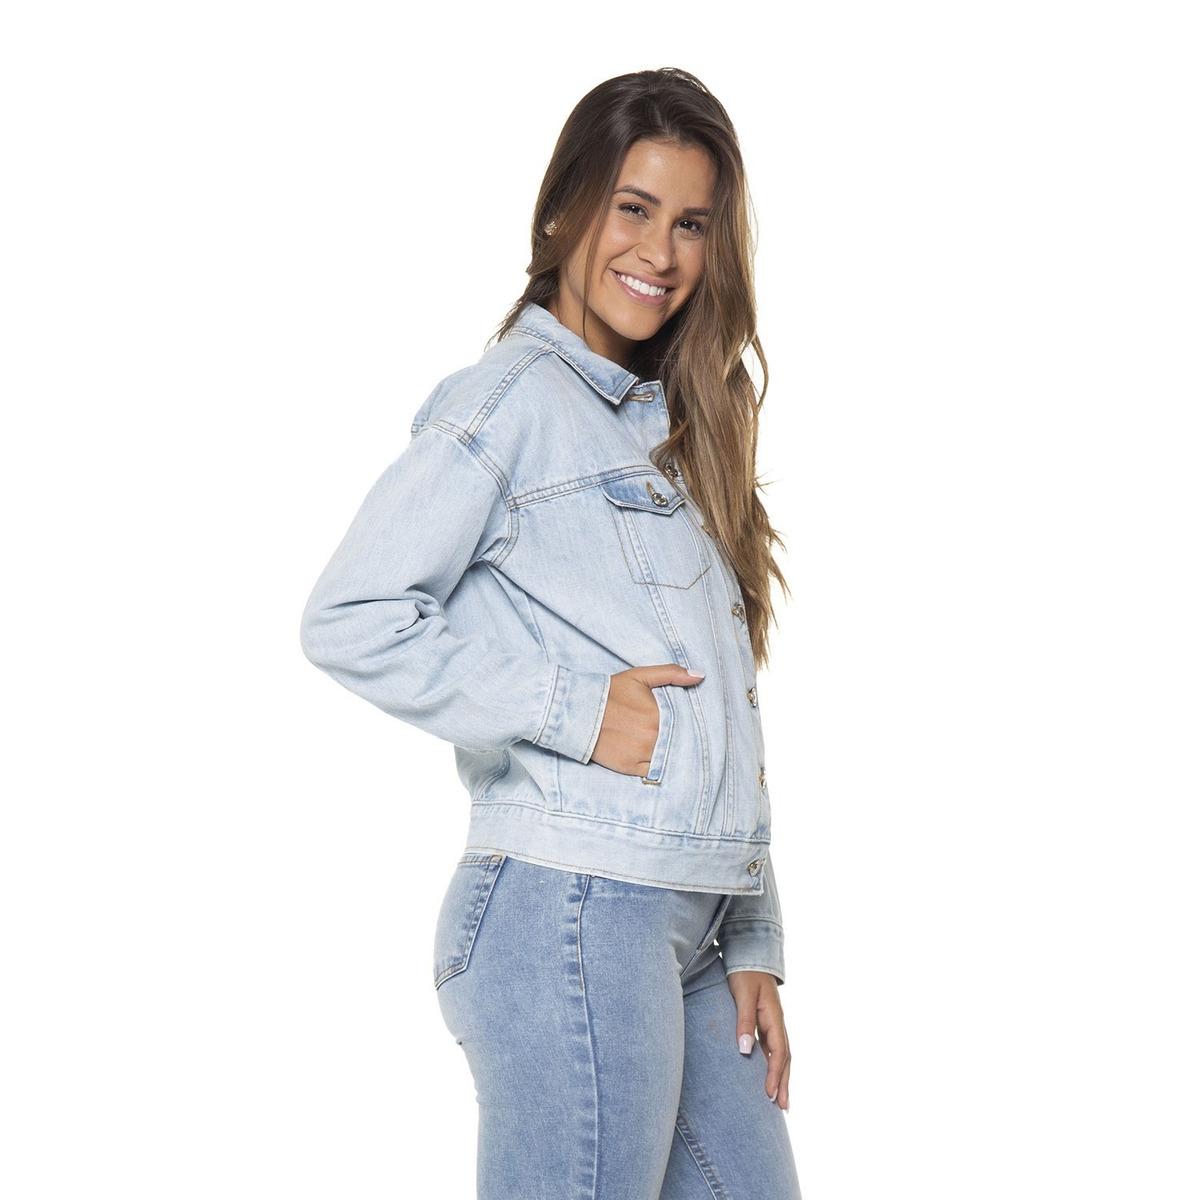 bea8c8713ea31 Jaqueta Feminina Jeans Tradicional Retro Denim Zero-dz9086 - R$ 274 ...